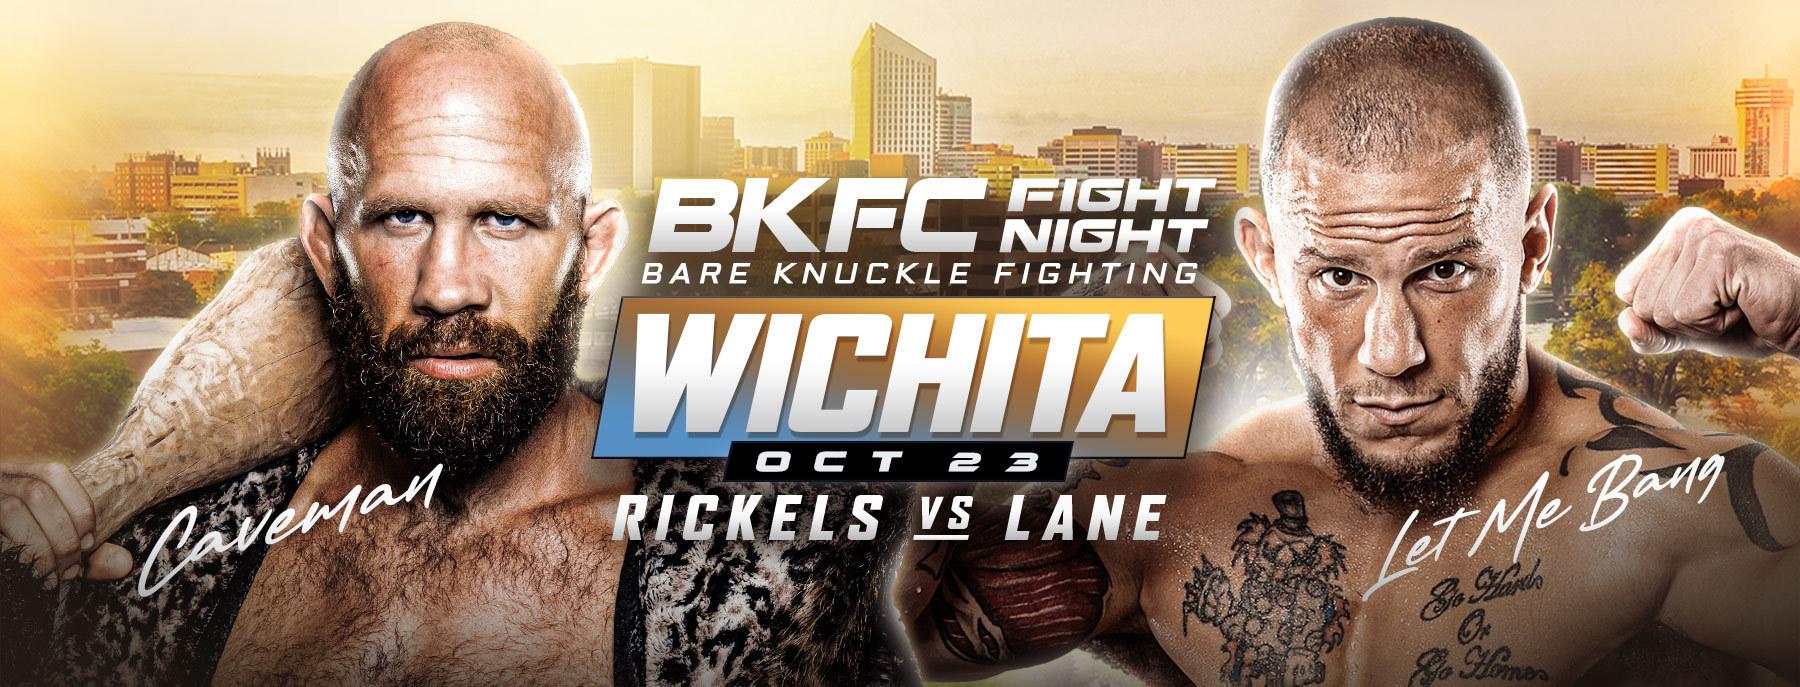 BKFC Fight Night Wichita Preview